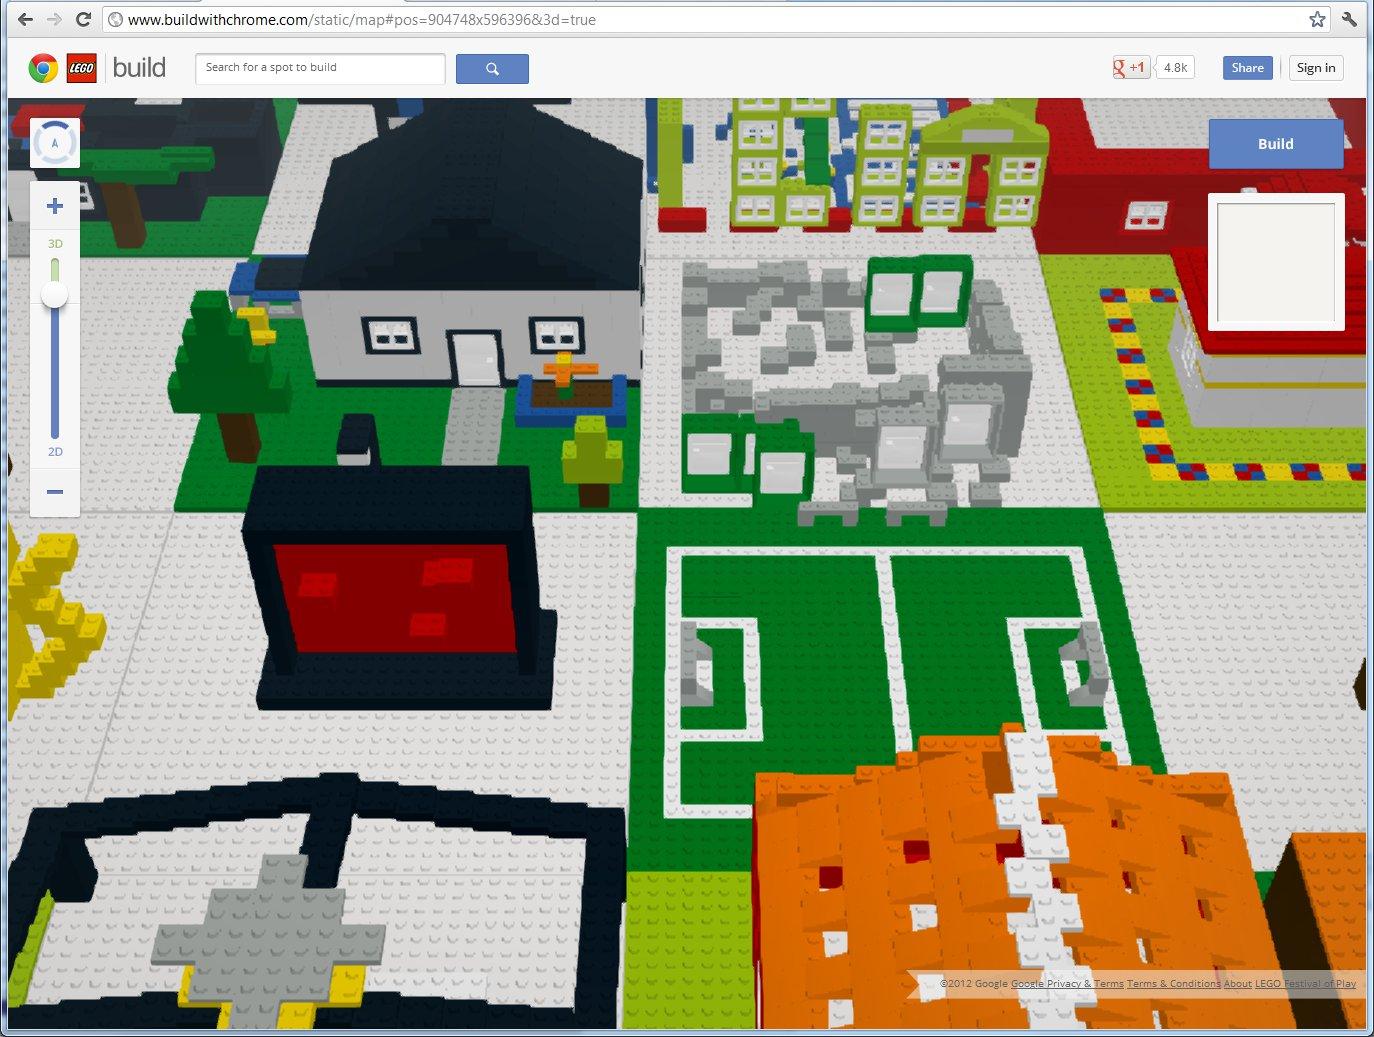 Still Plays With Bricks - A Lego fan blog: Build with Chrome